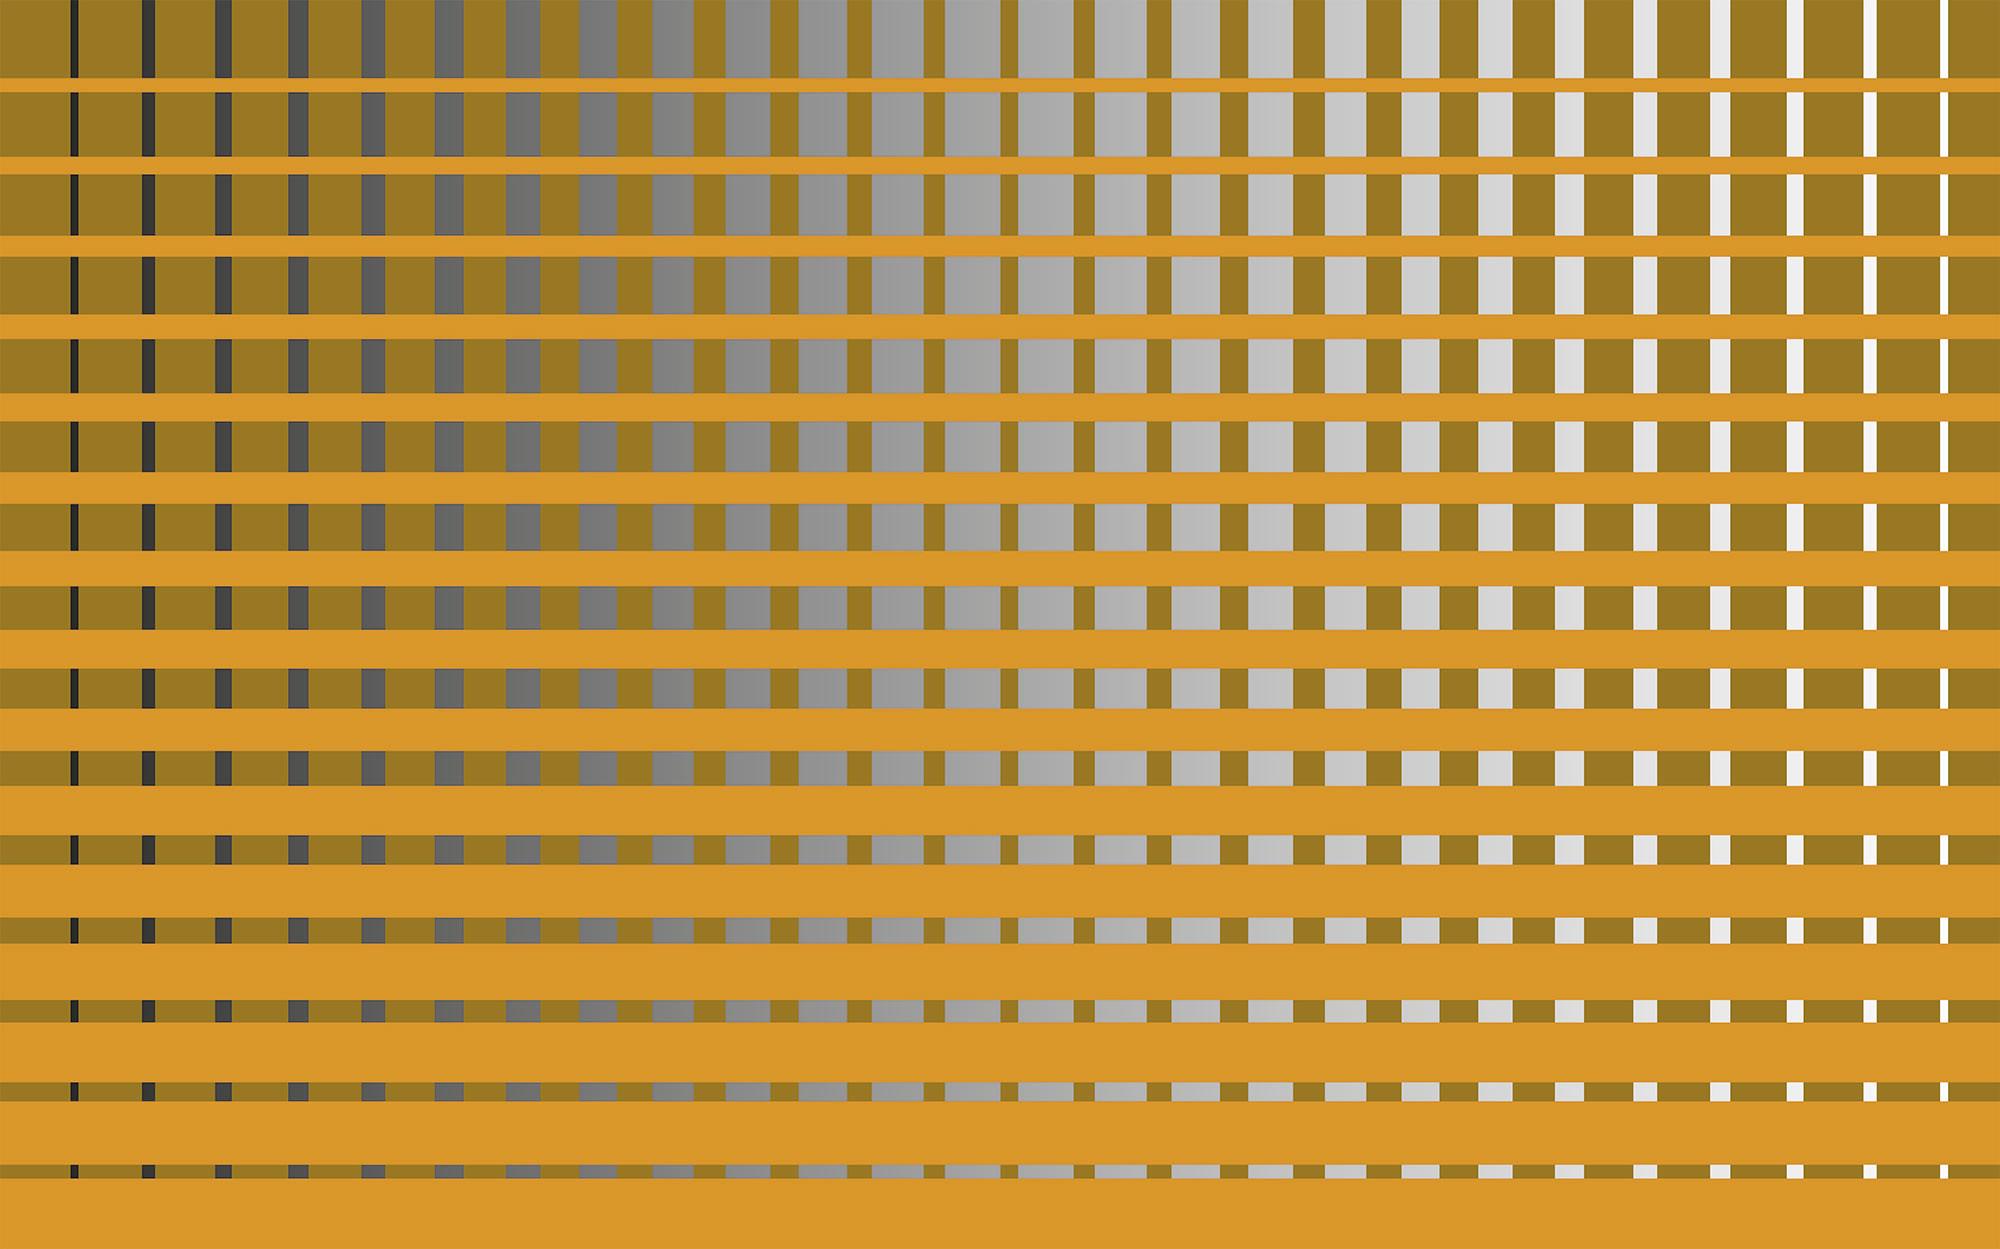 Griddy orangecognac-grey